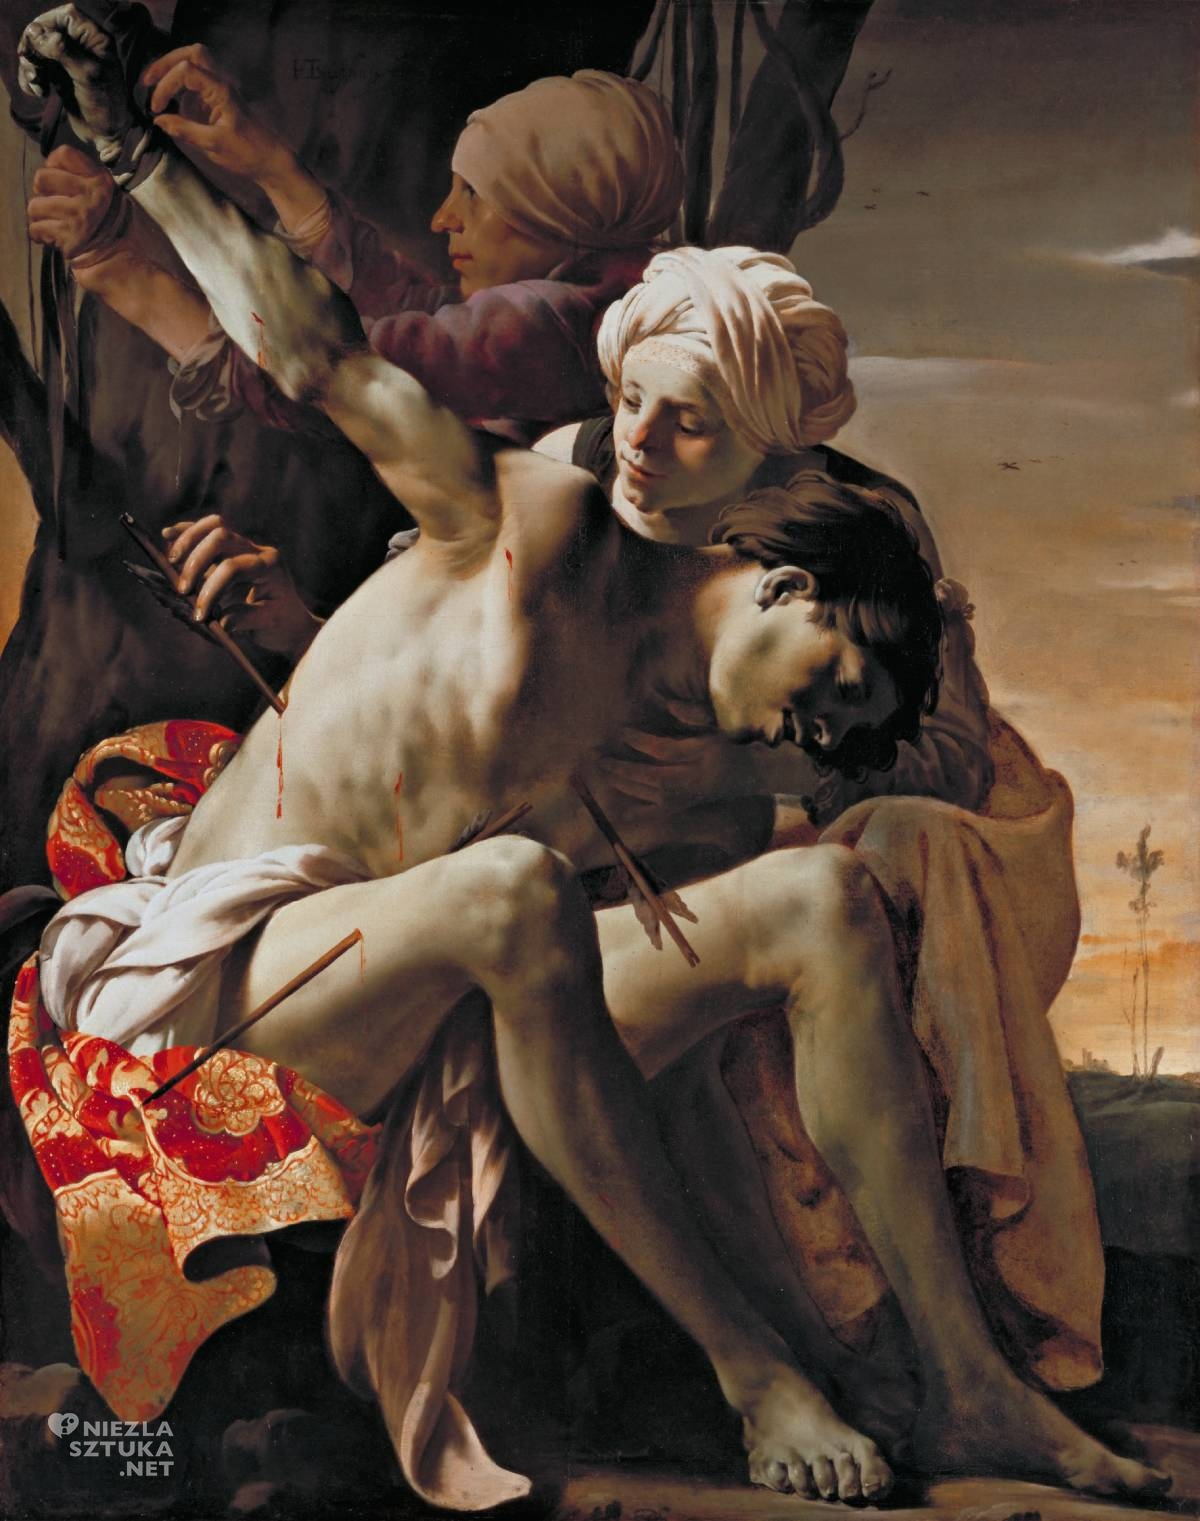 Hendrick ter Brugghen, święty Sebastian pielęgnowany przez świętą Irenę, sztuka religijna, sztuka niderlandzka, szkoła utrechcka, caravaggionizm, Niezła Sztuka